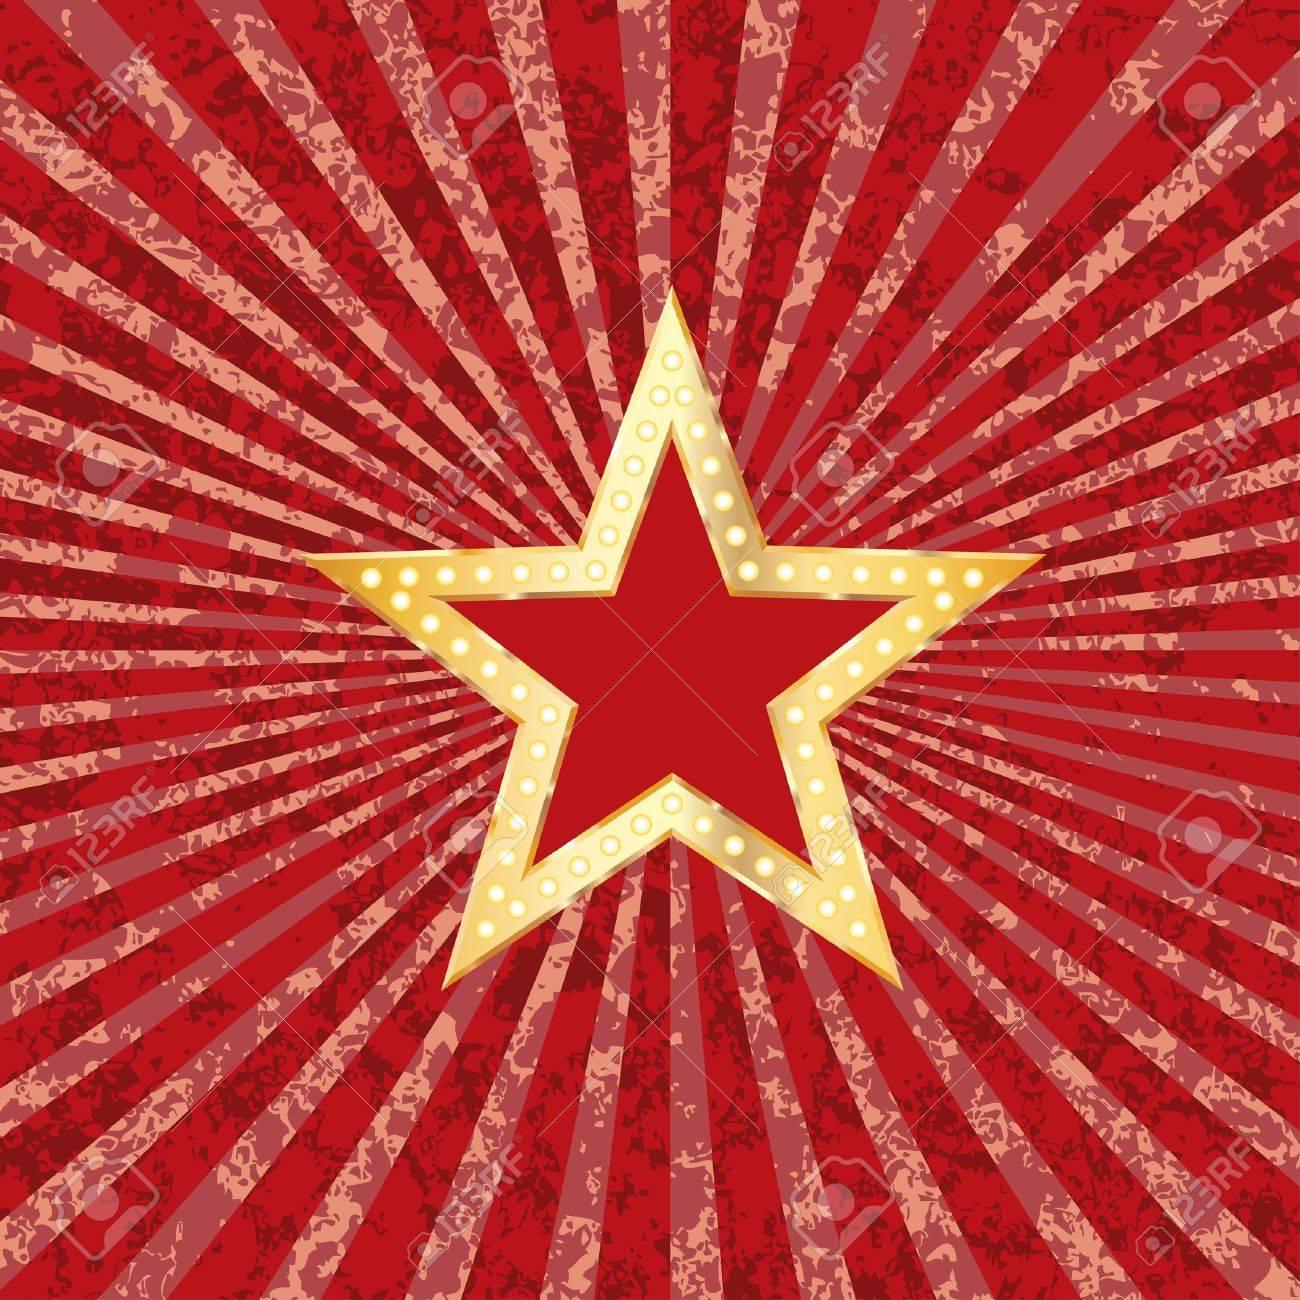 Golden Red Star On Grunge Burst Background Royalty Free Cliparts ...